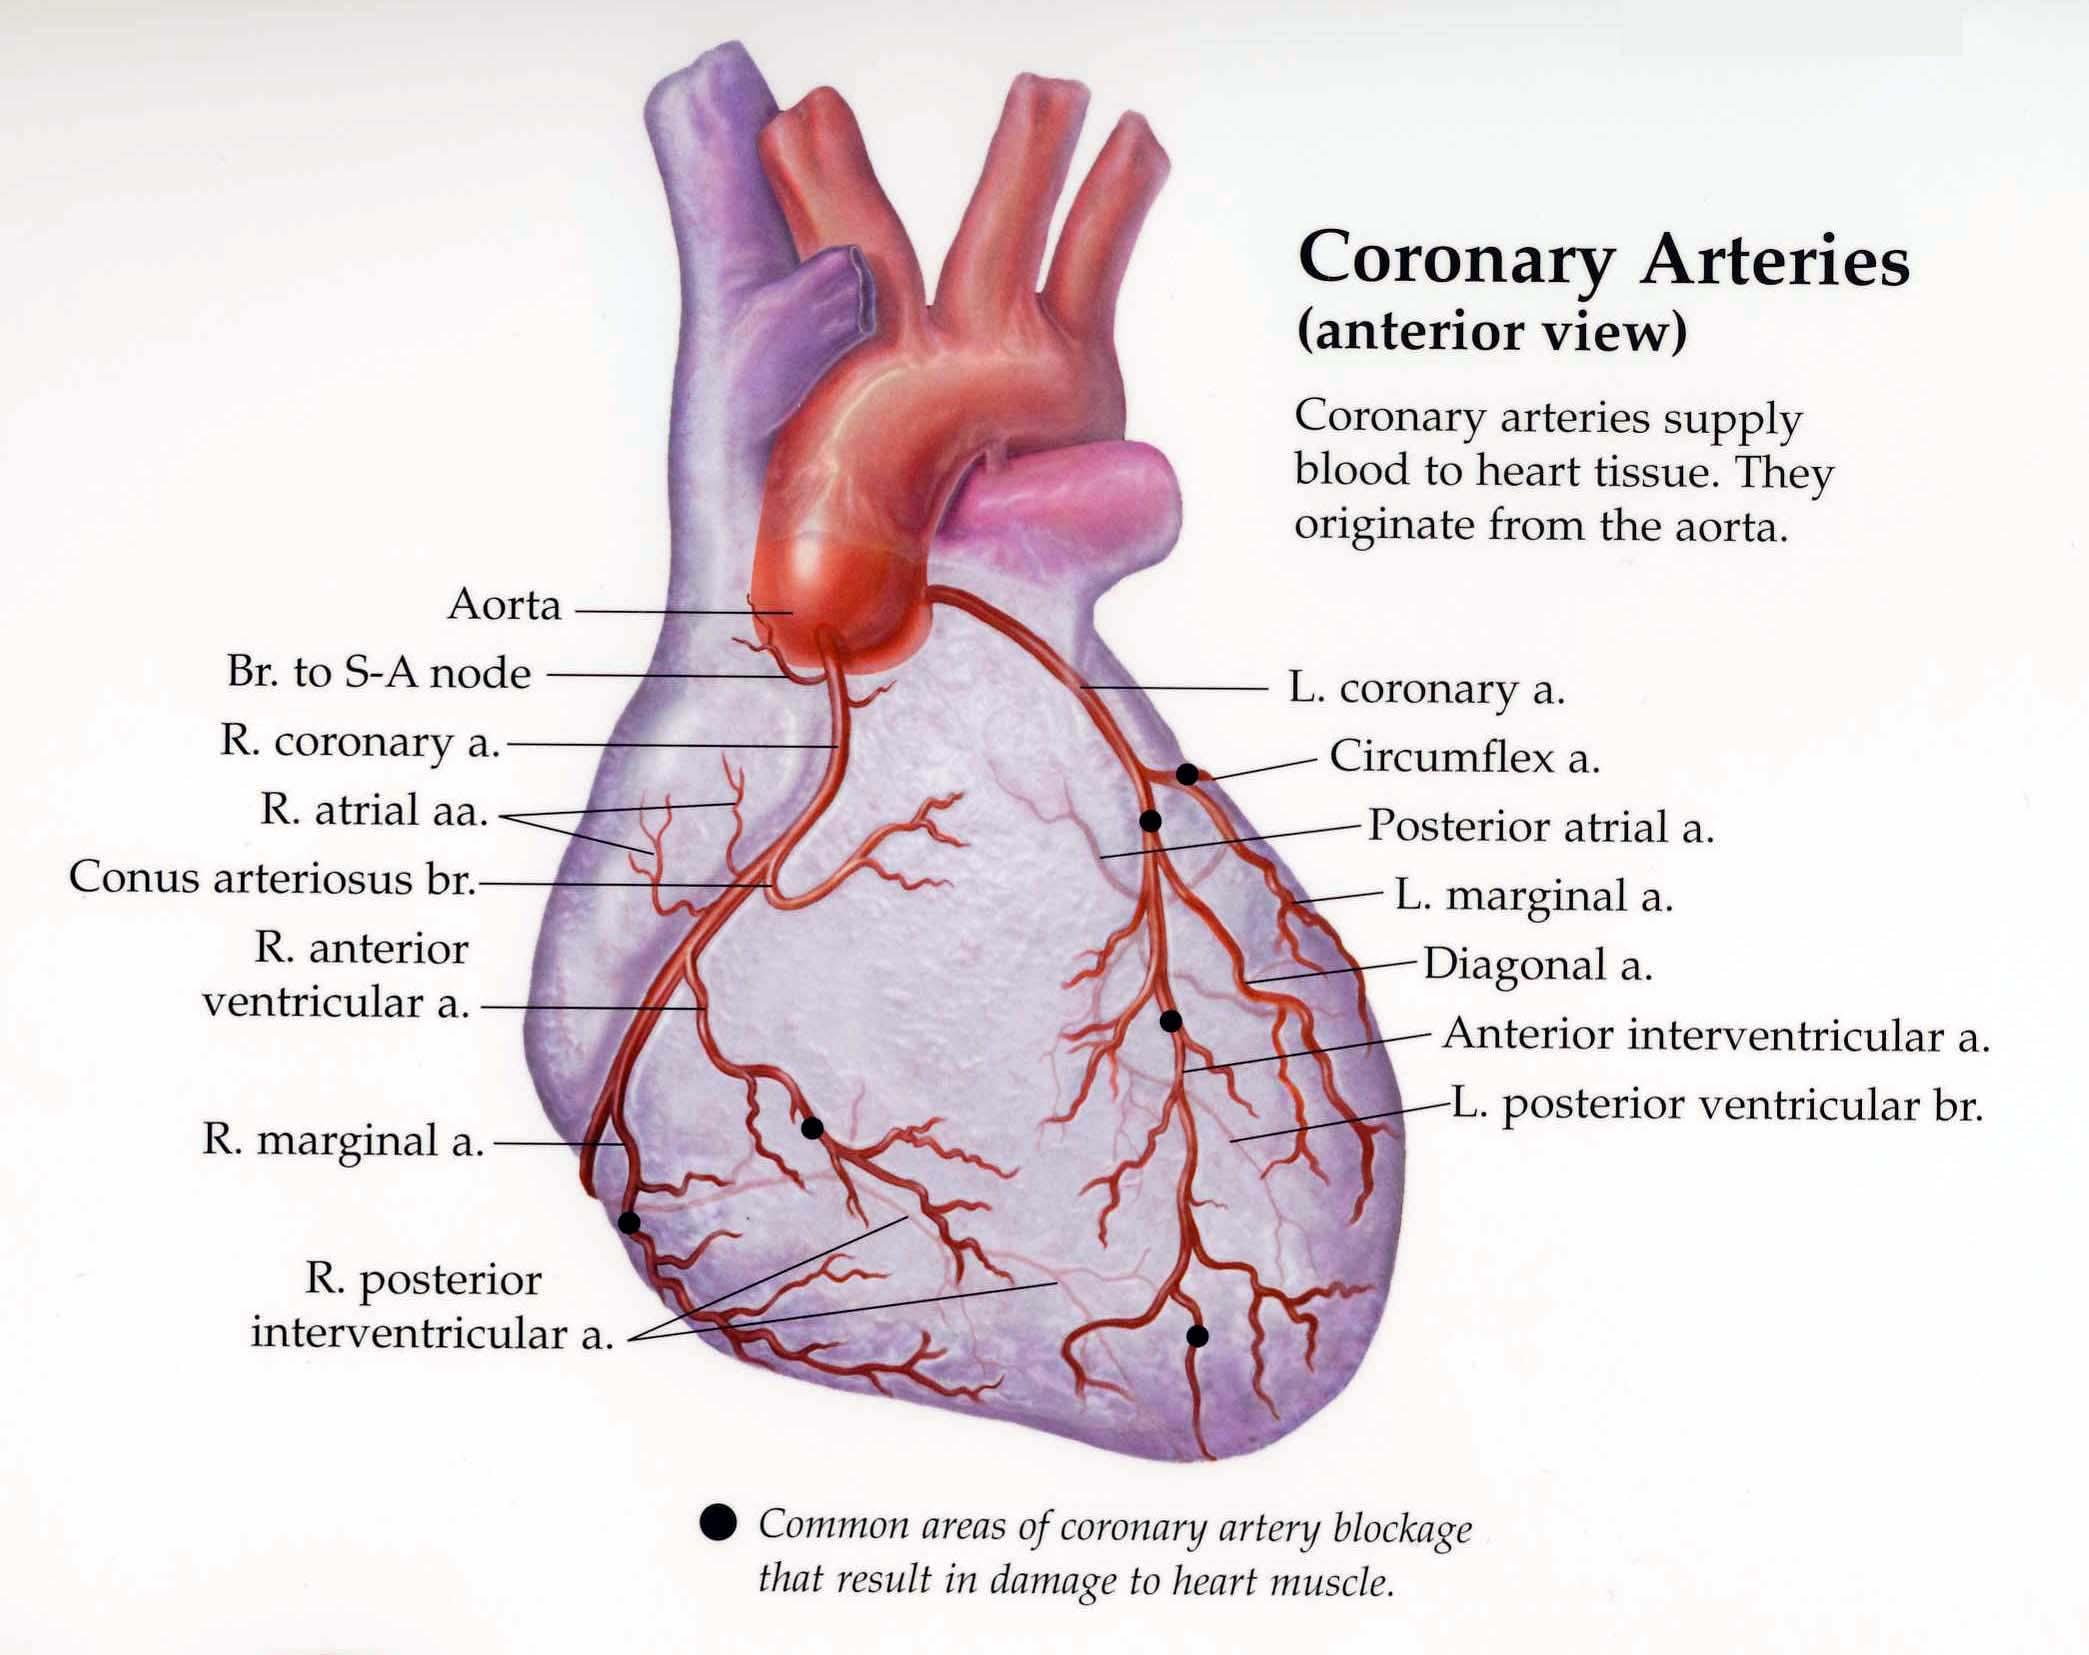 Fein Cardiovascular Anatomy And Physiology Galerie - Menschliche ...